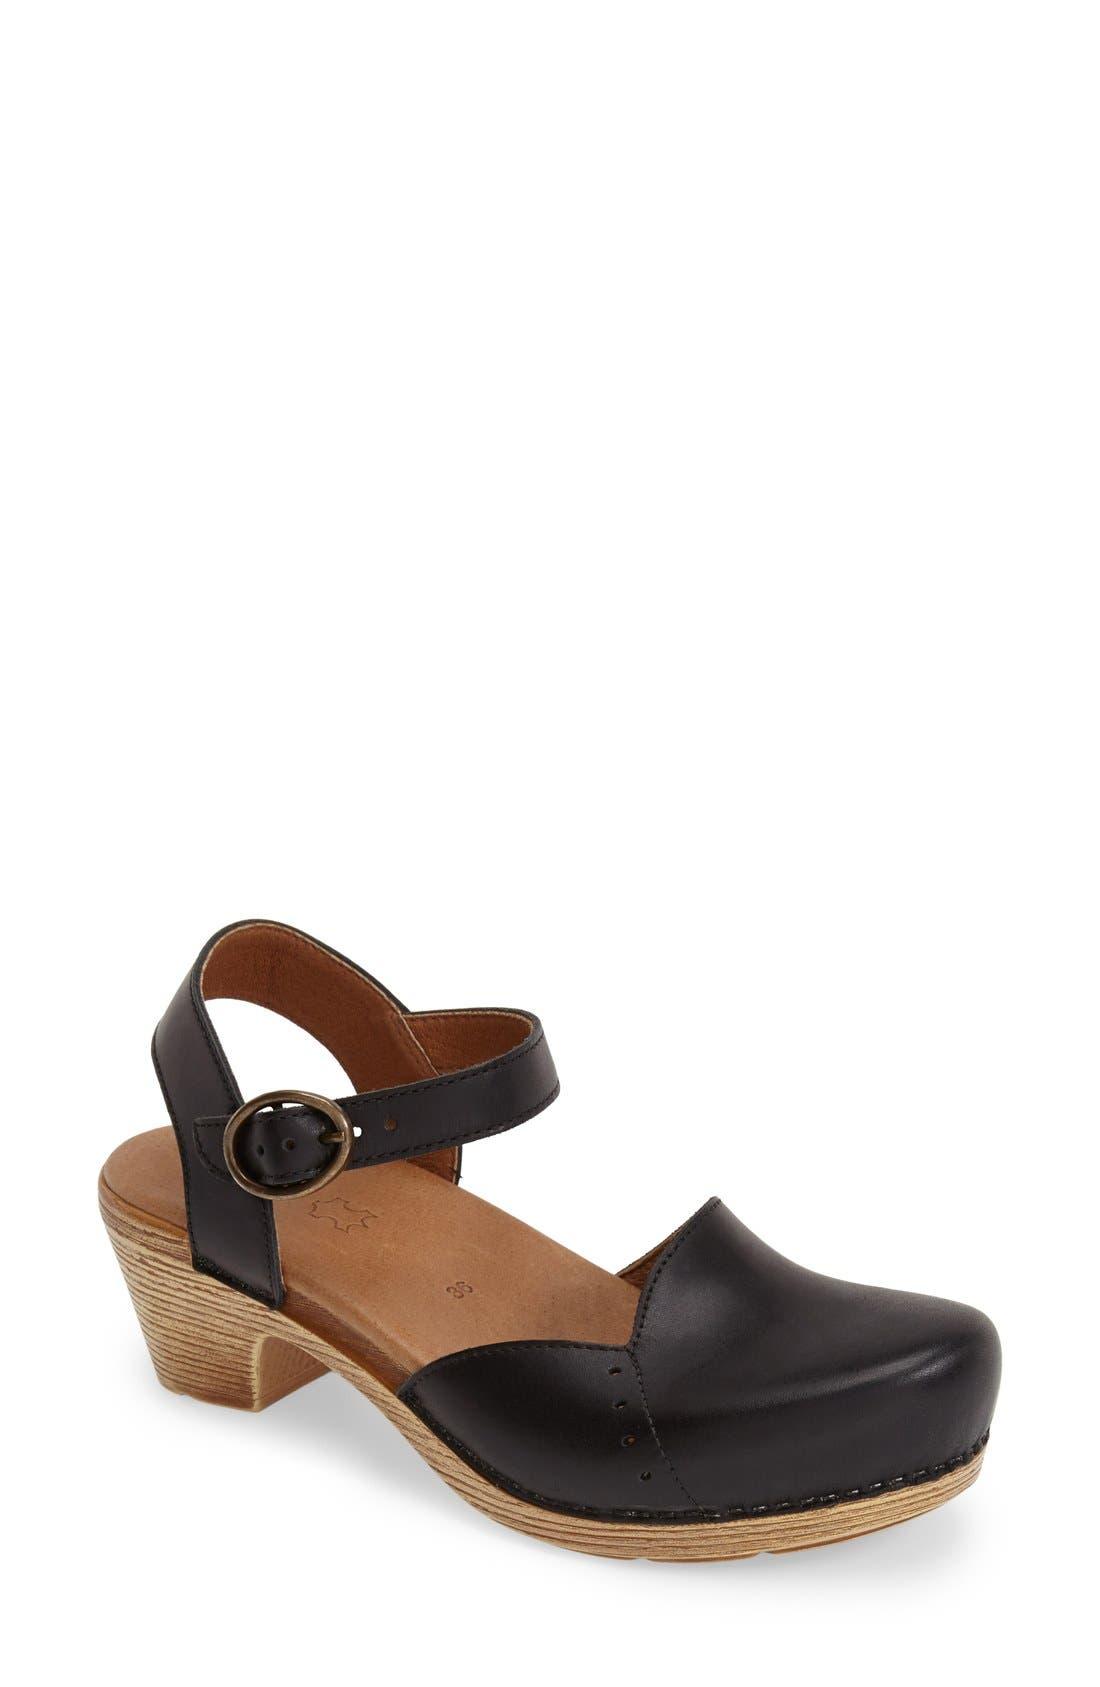 Alternate Image 1 Selected - Dansko 'Maisie' Ankle Strap Leather Pump (Women)